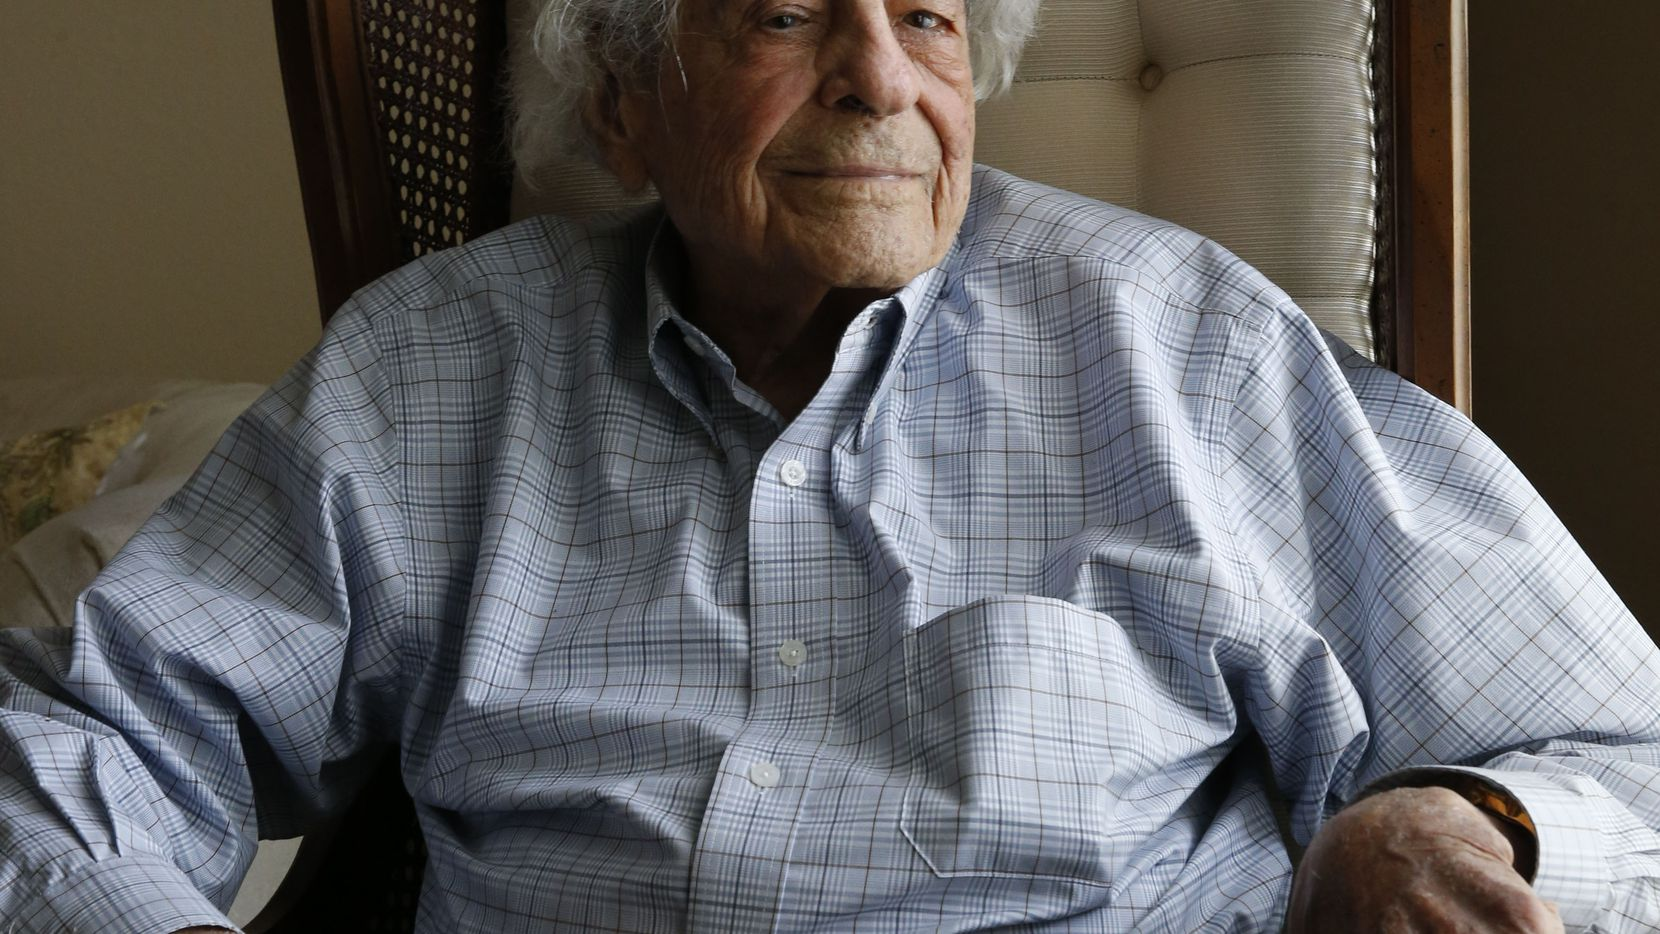 James Megellas poses for a portrait at age 101.